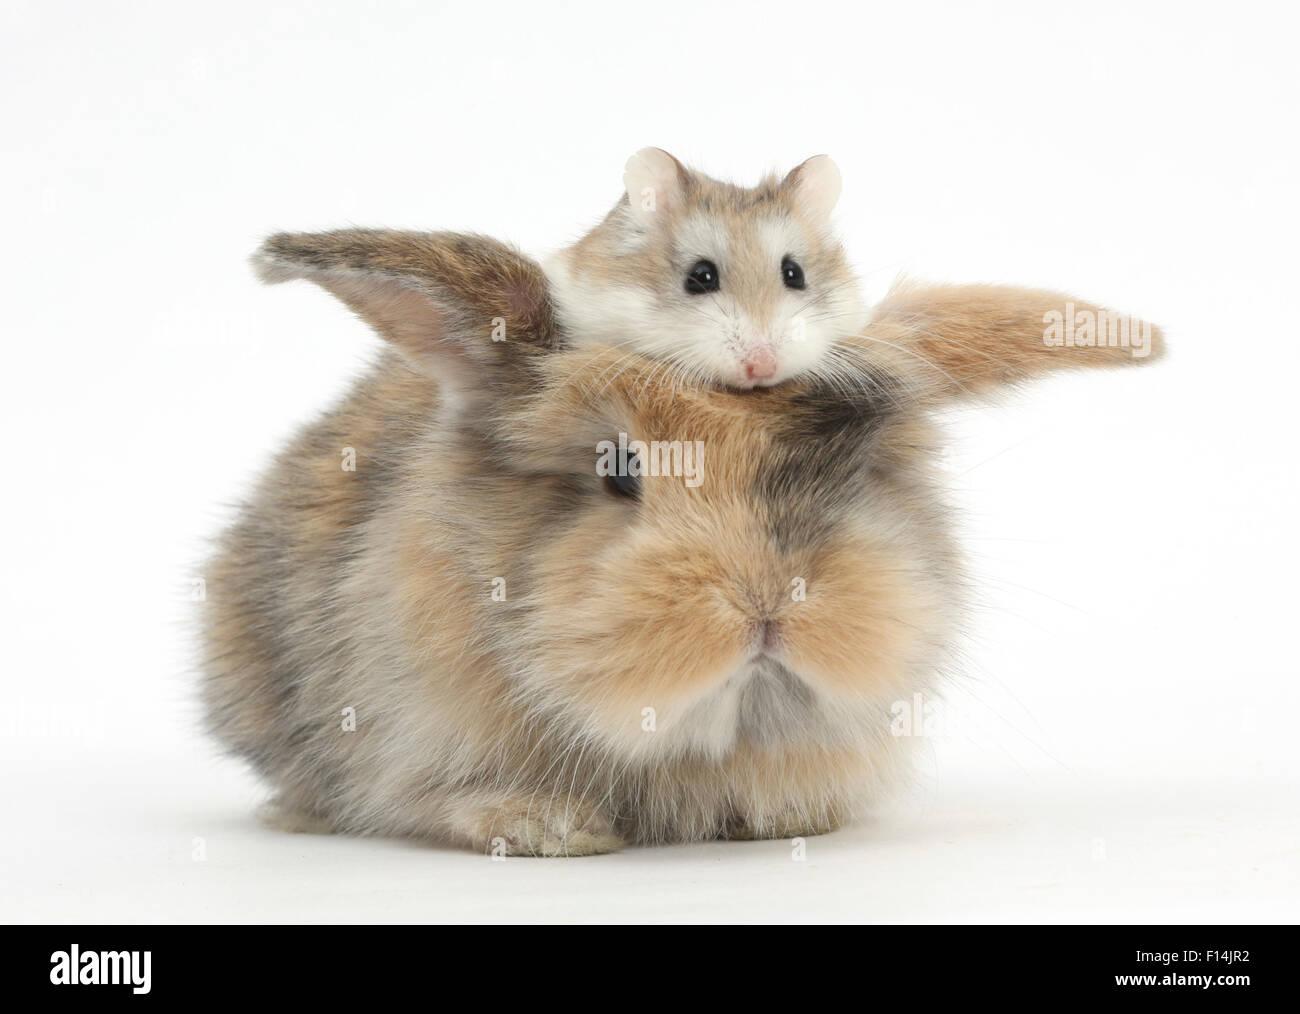 Baby rabbit with a Roborovski Hamster (Phodopus roborovskii) sitting on its head. - Stock Image